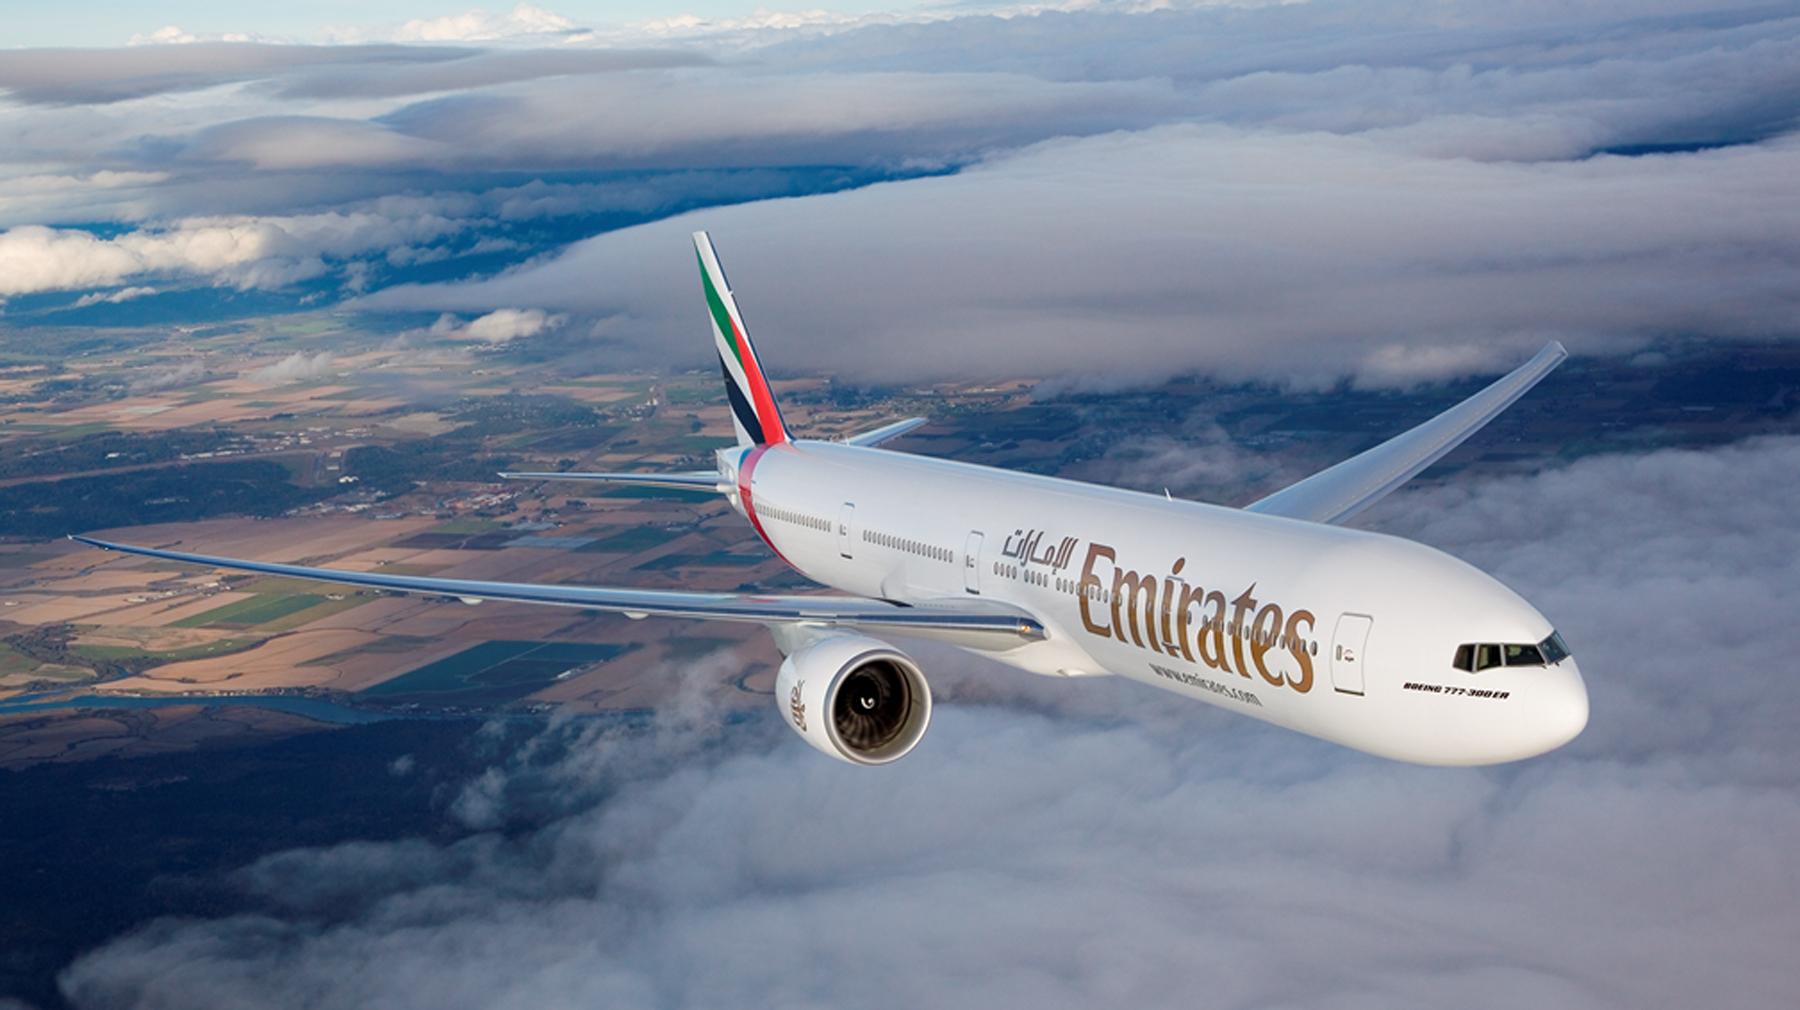 Emirates_Boeing_777-300_ER_aircraft.jpeg